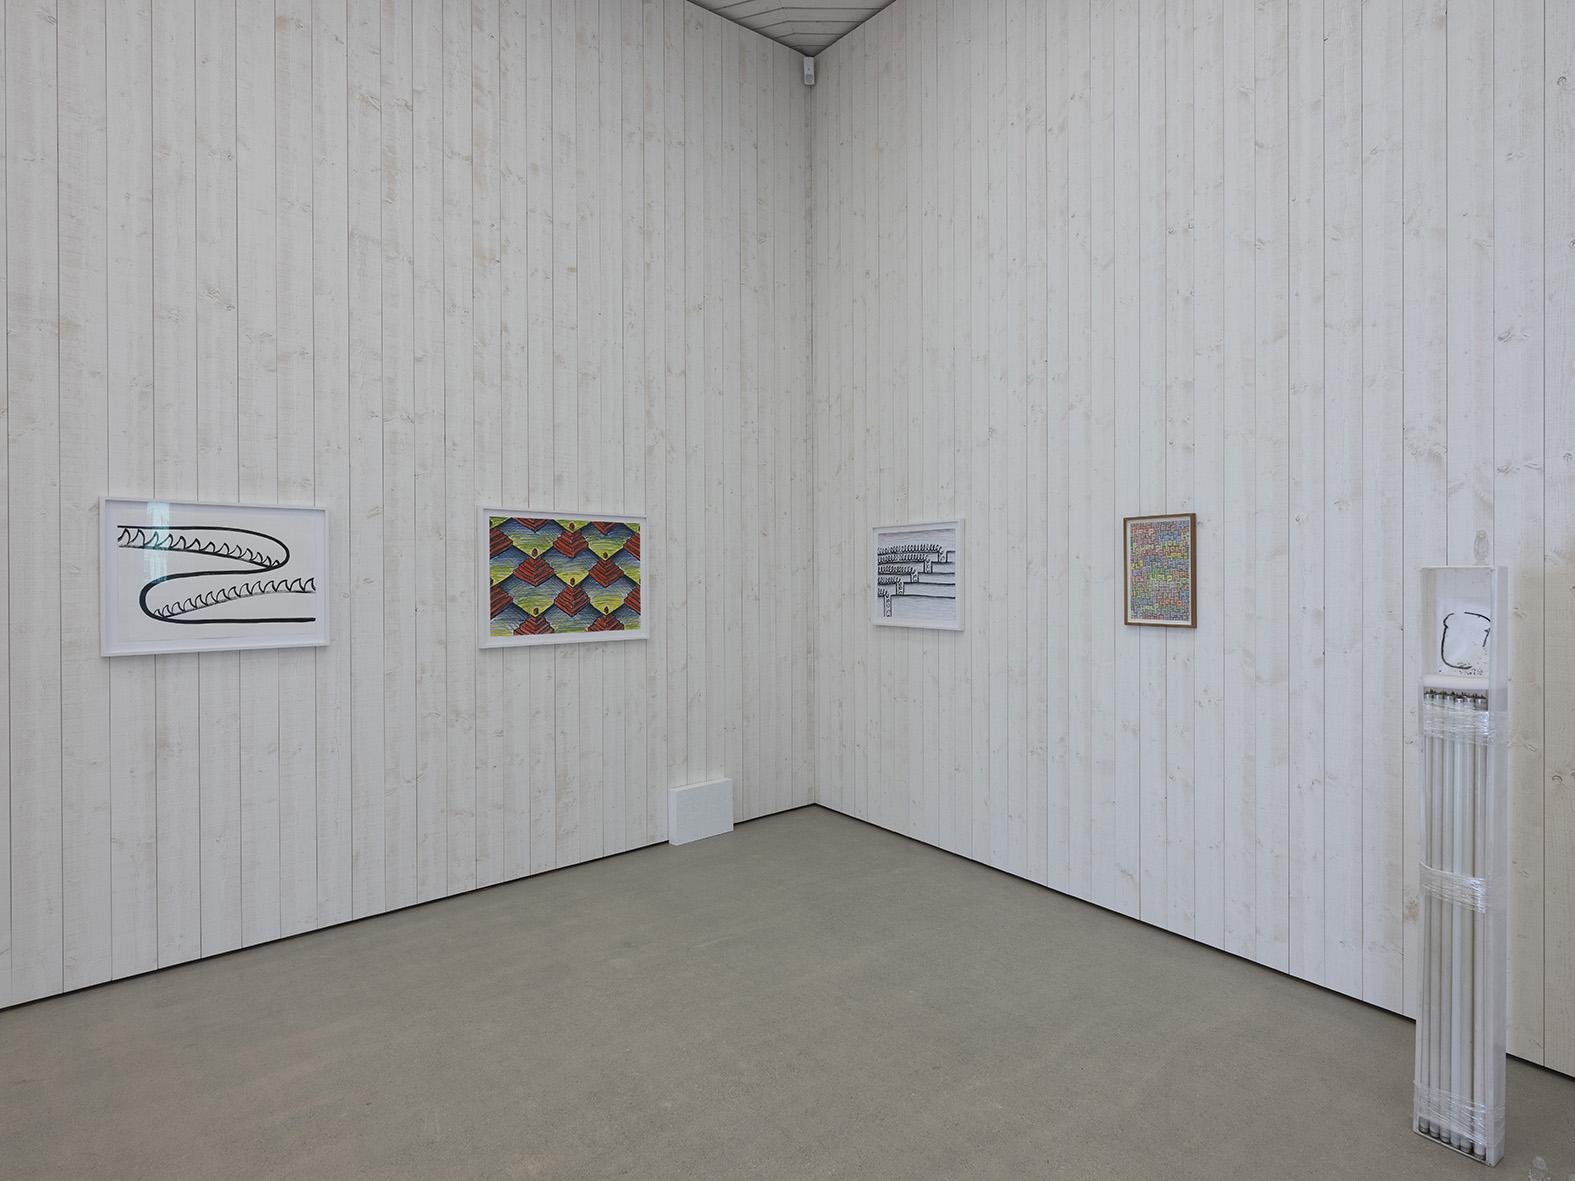 Sam Porritt at Nidwaldner Museum, Stans, CH